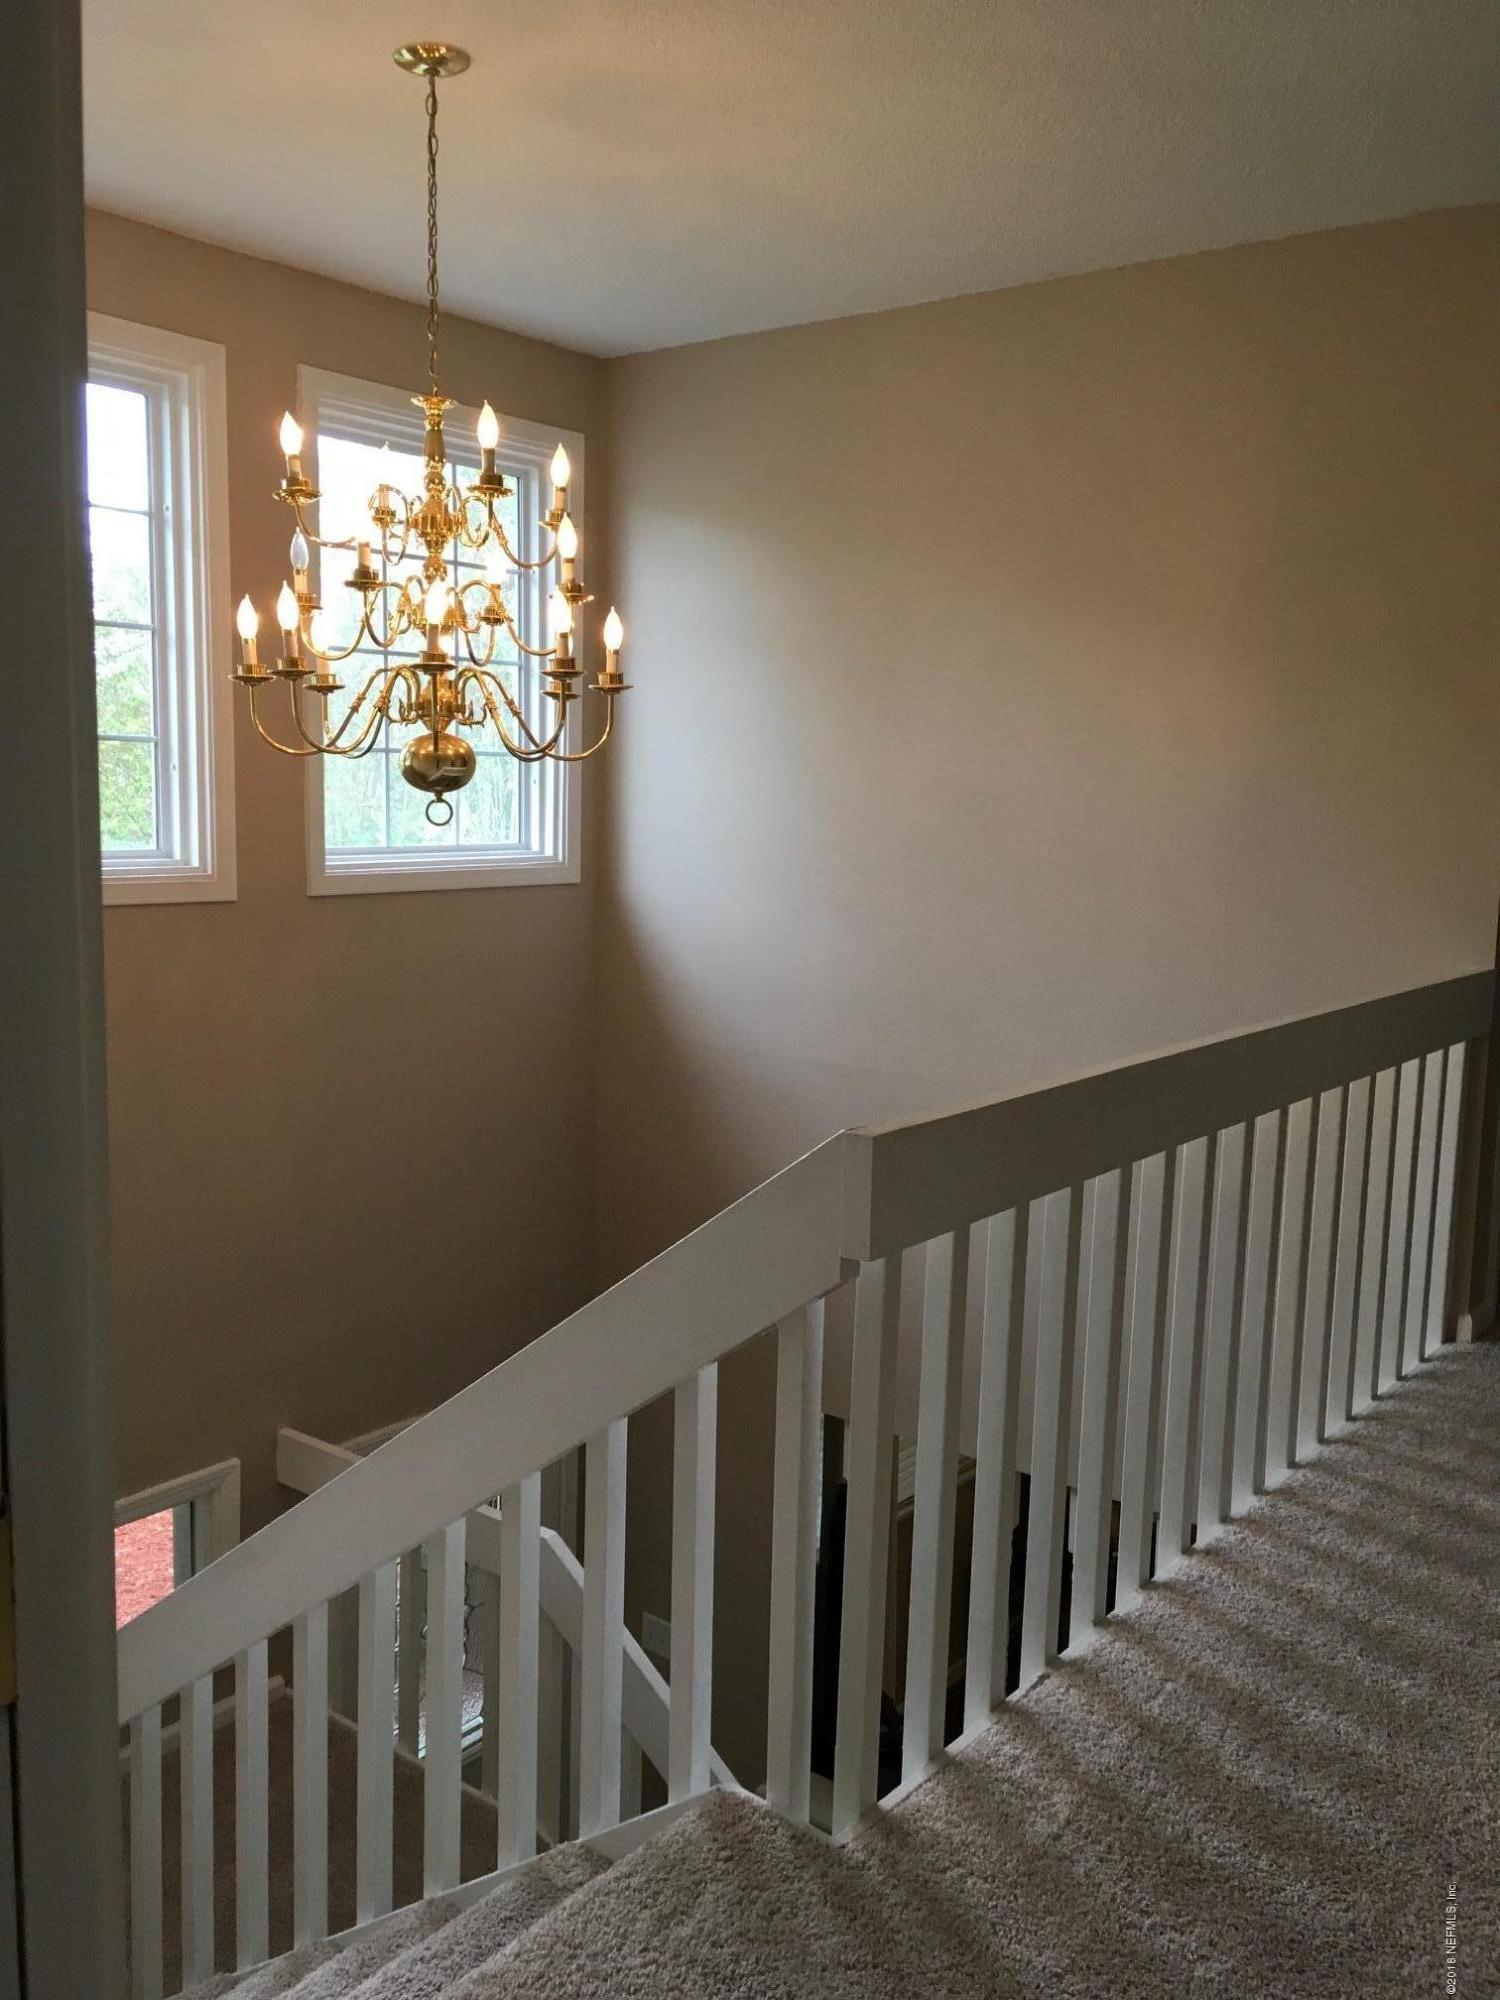 310 GLENEAGLES, ORANGE PARK, FLORIDA 32073, 4 Bedrooms Bedrooms, ,2 BathroomsBathrooms,Residential - single family,For sale,GLENEAGLES,960240